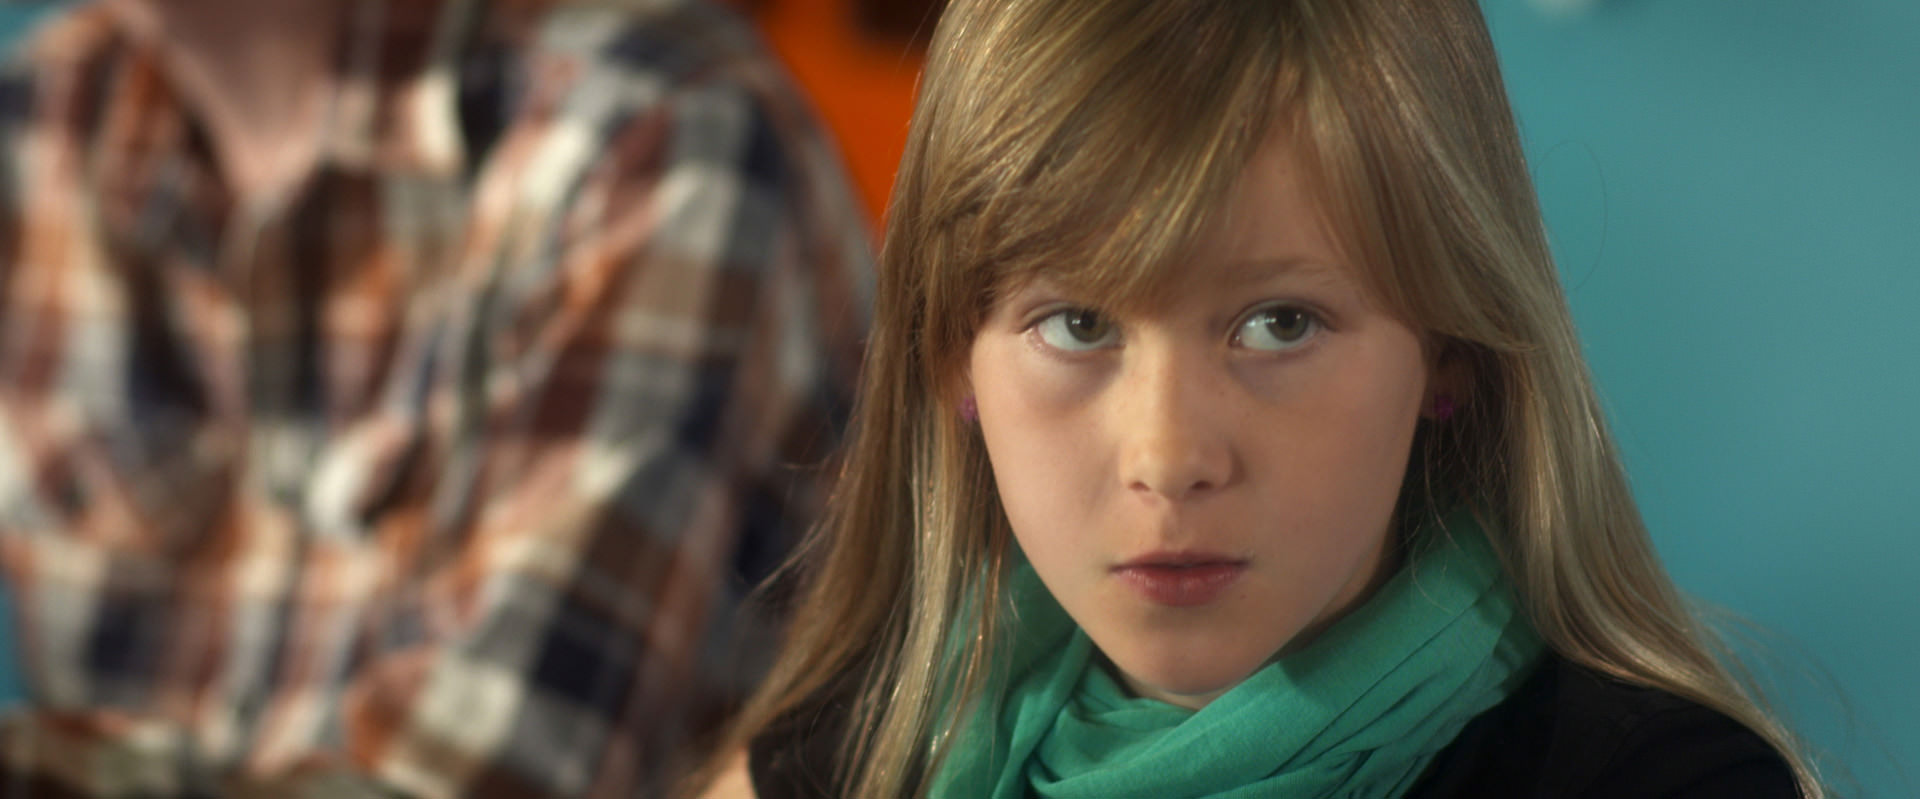 "Filmstill uit ""D.E.A.L. de Pilot"" met Aiko Beemsterboer"